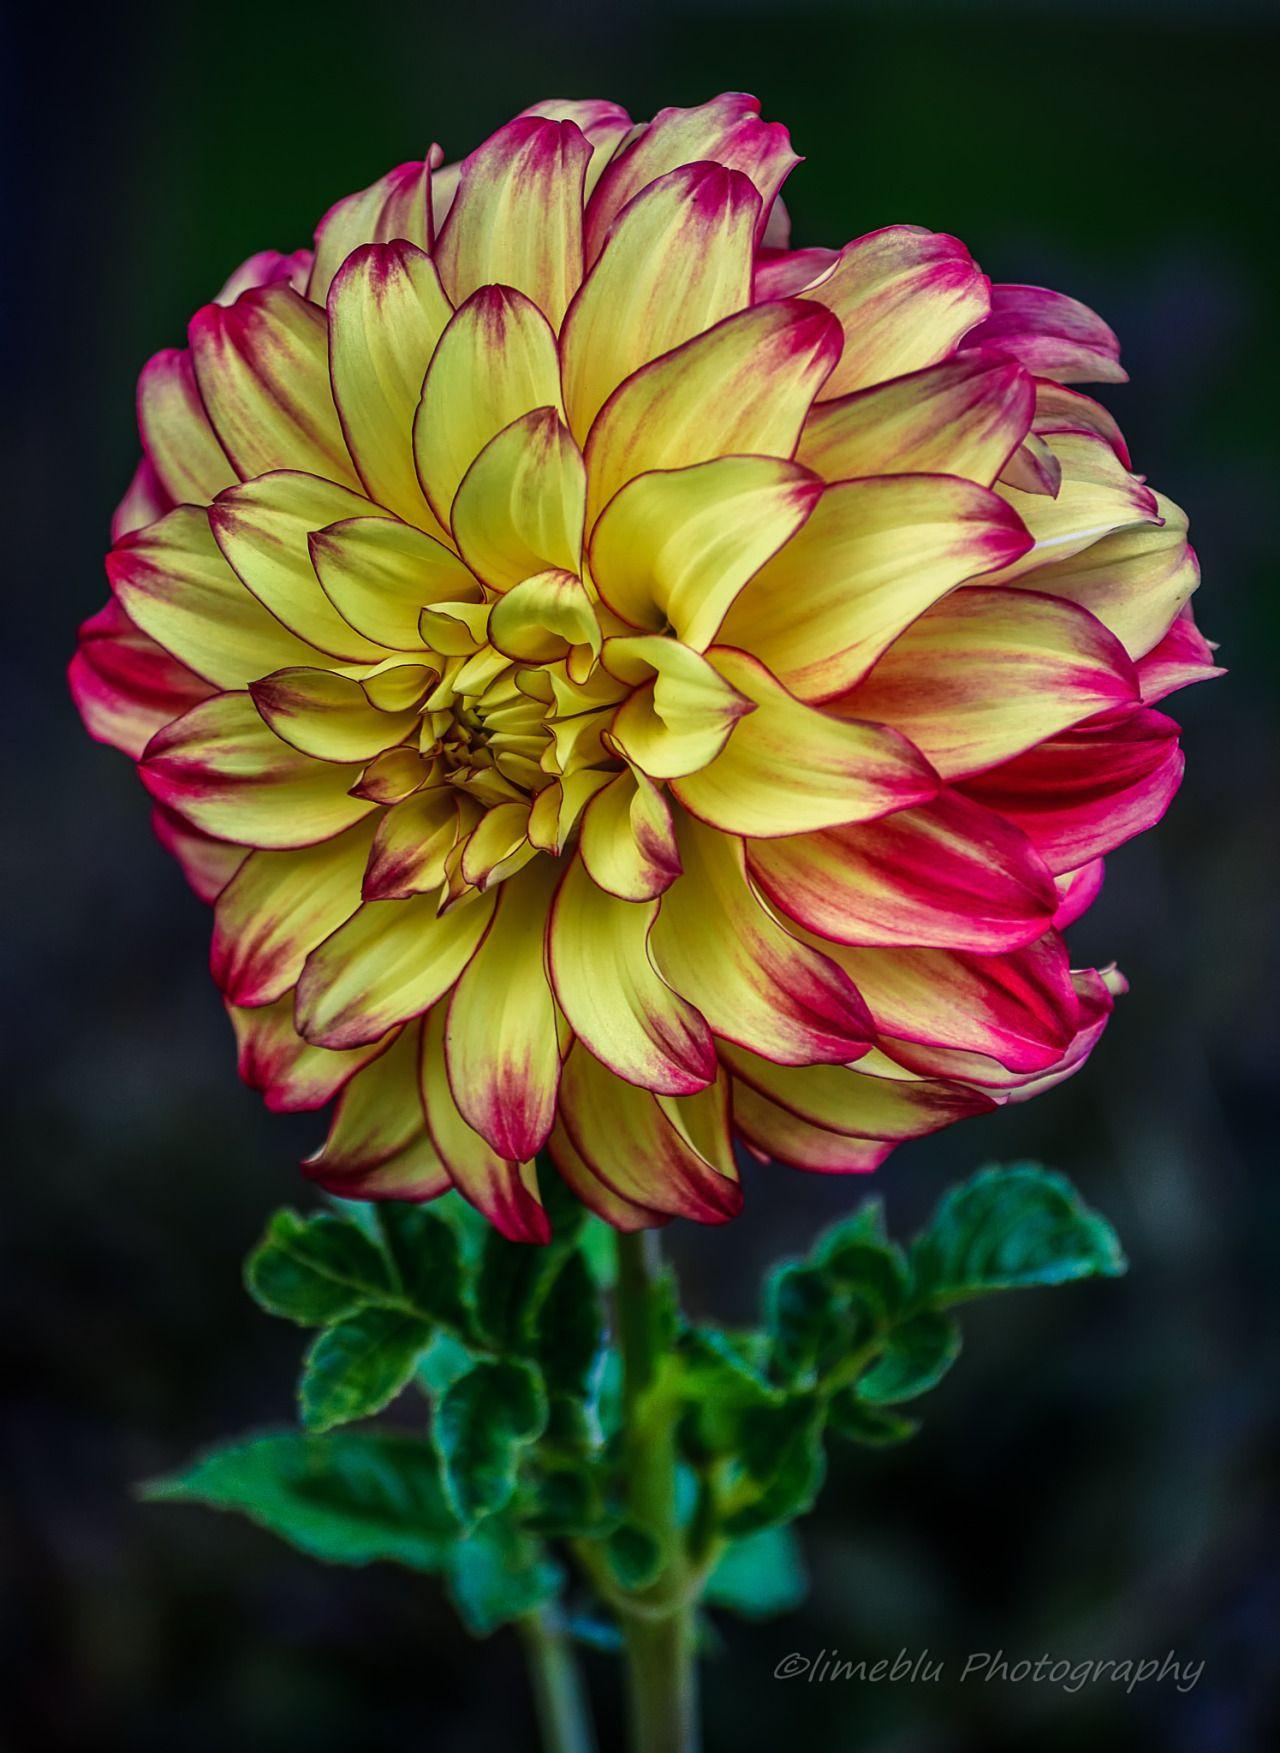 Beautiful flowers flowers pinterest beautiful flowers flower beautiful flowers izmirmasajfo